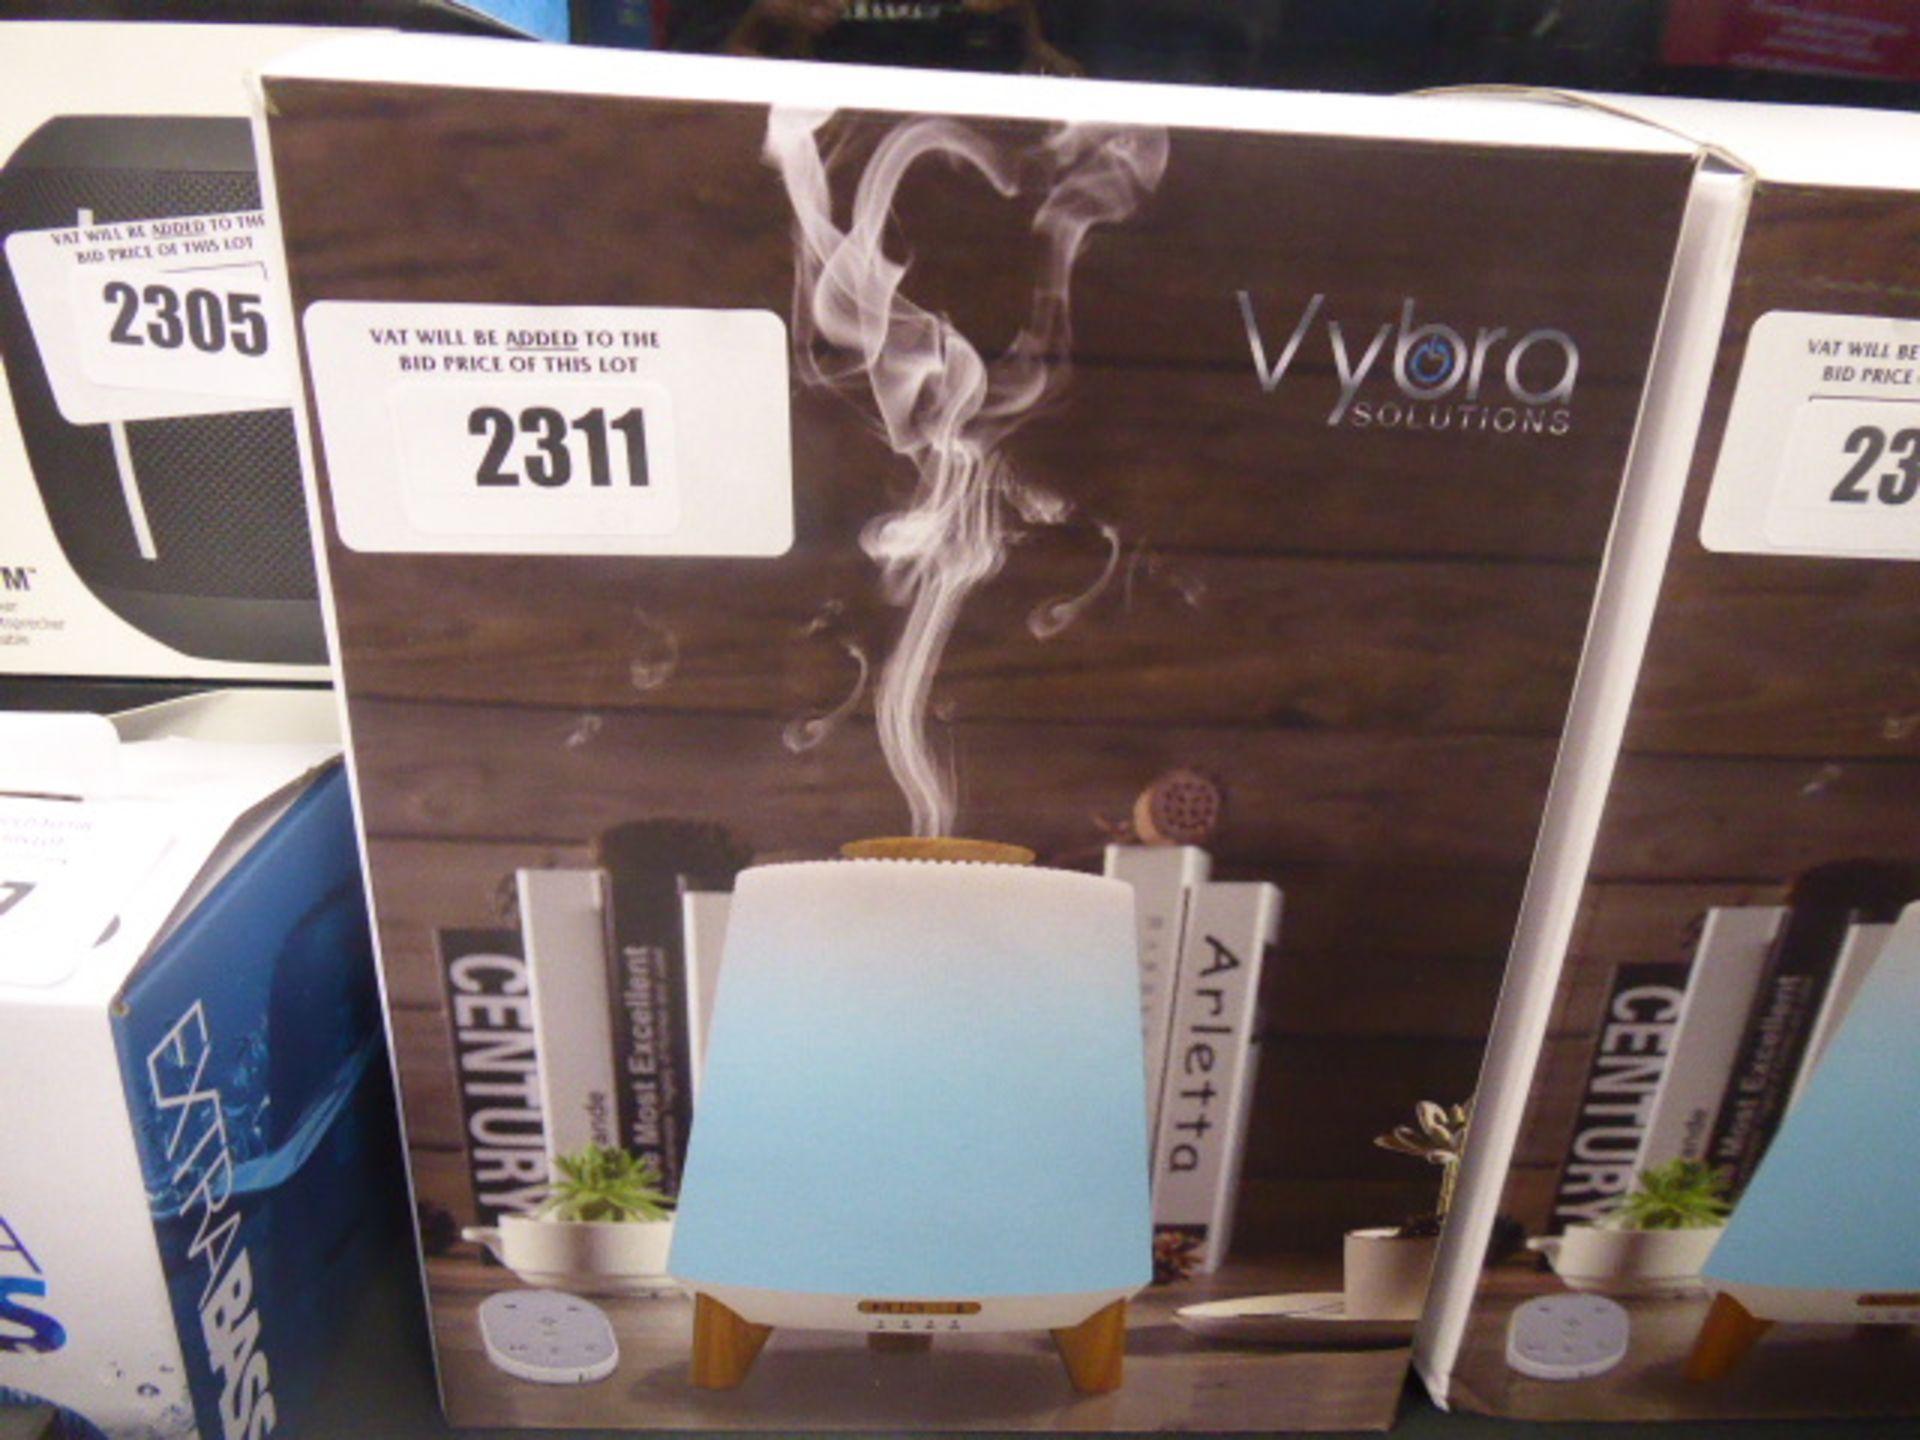 Lot 2311 - VYBRA Solutions atmos speaker in box